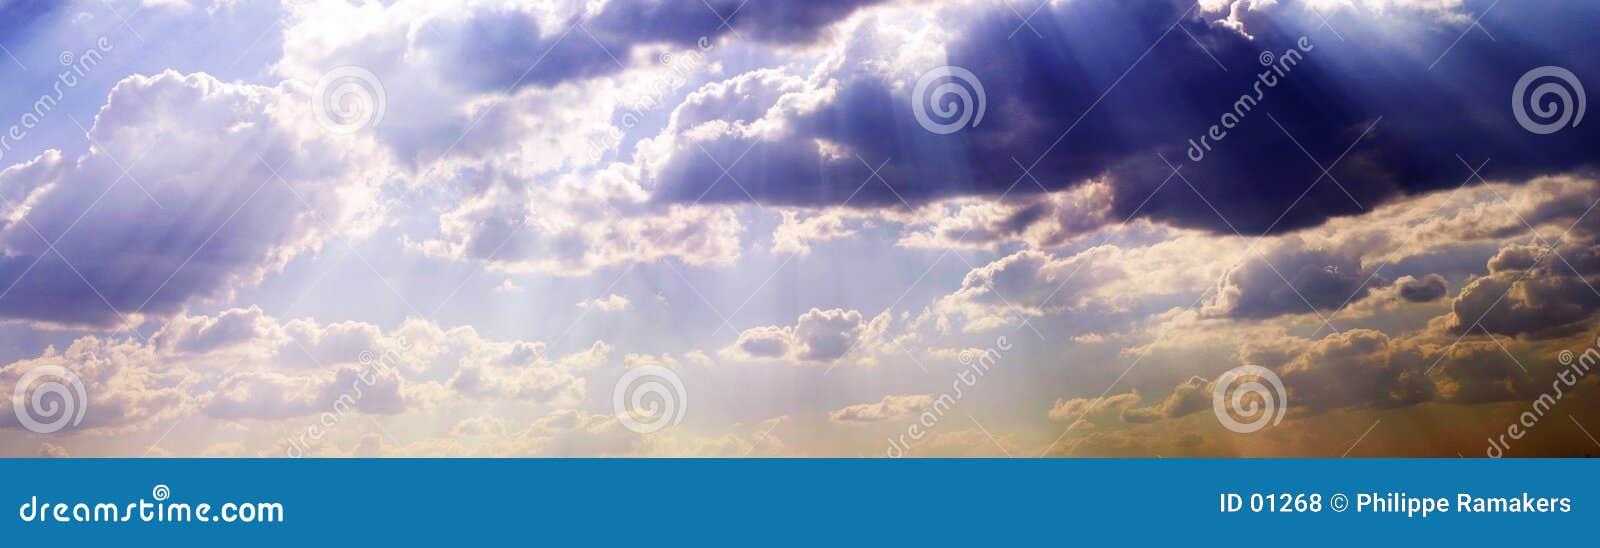 Brede hemel met wolken